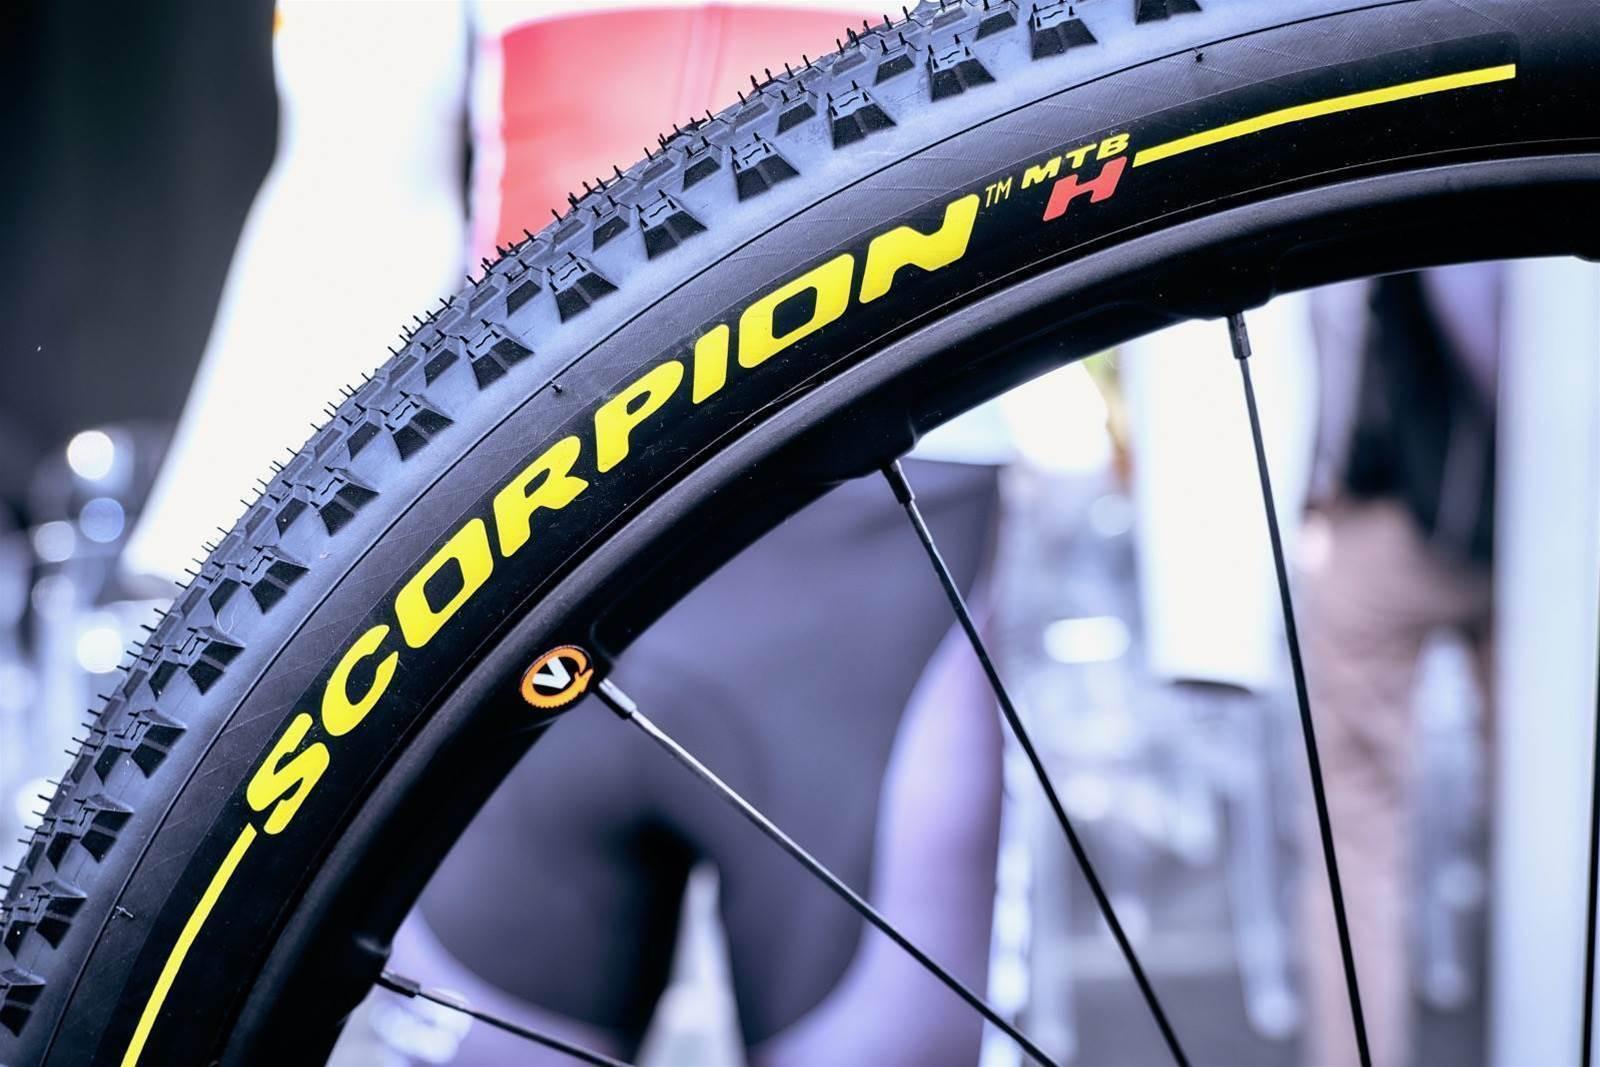 Pirelli release the Scorpion MTB range